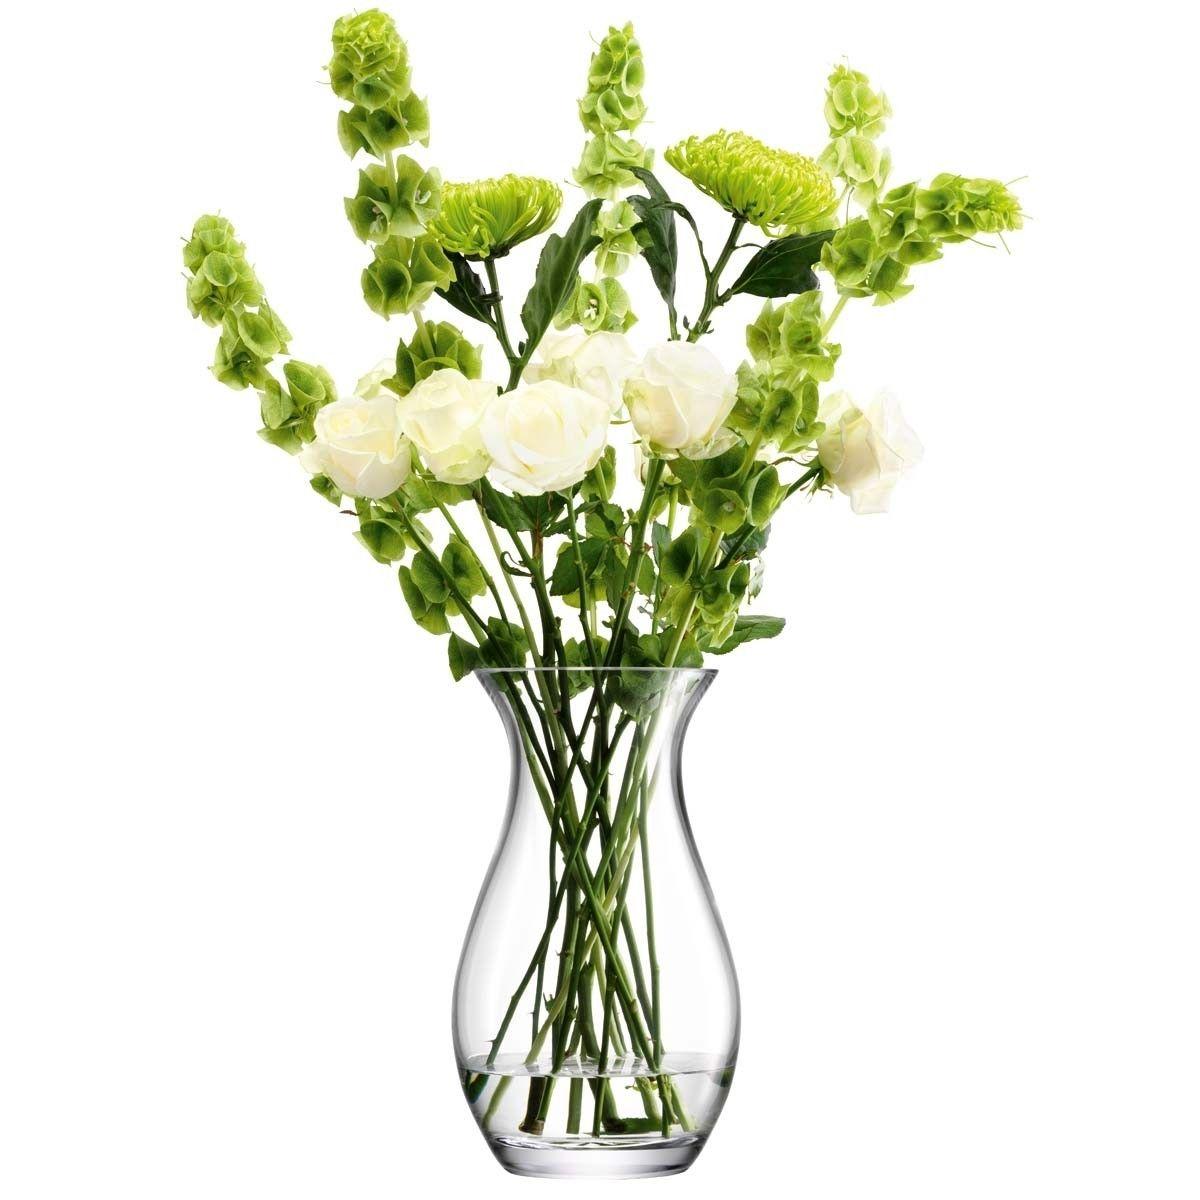 Flower Vase Png Cvety